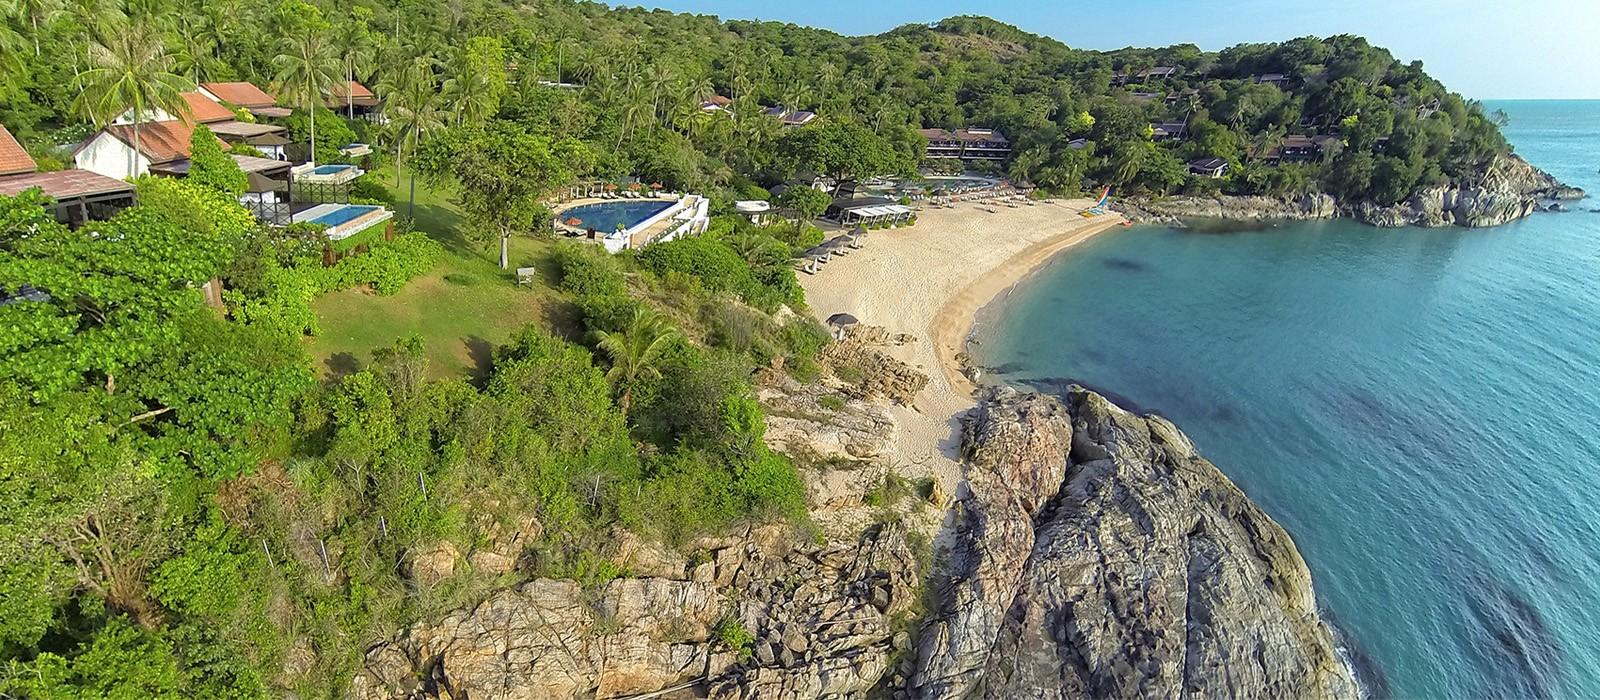 Header - Tongsai Bay Koh Samui - Luxury Thailand Holidays